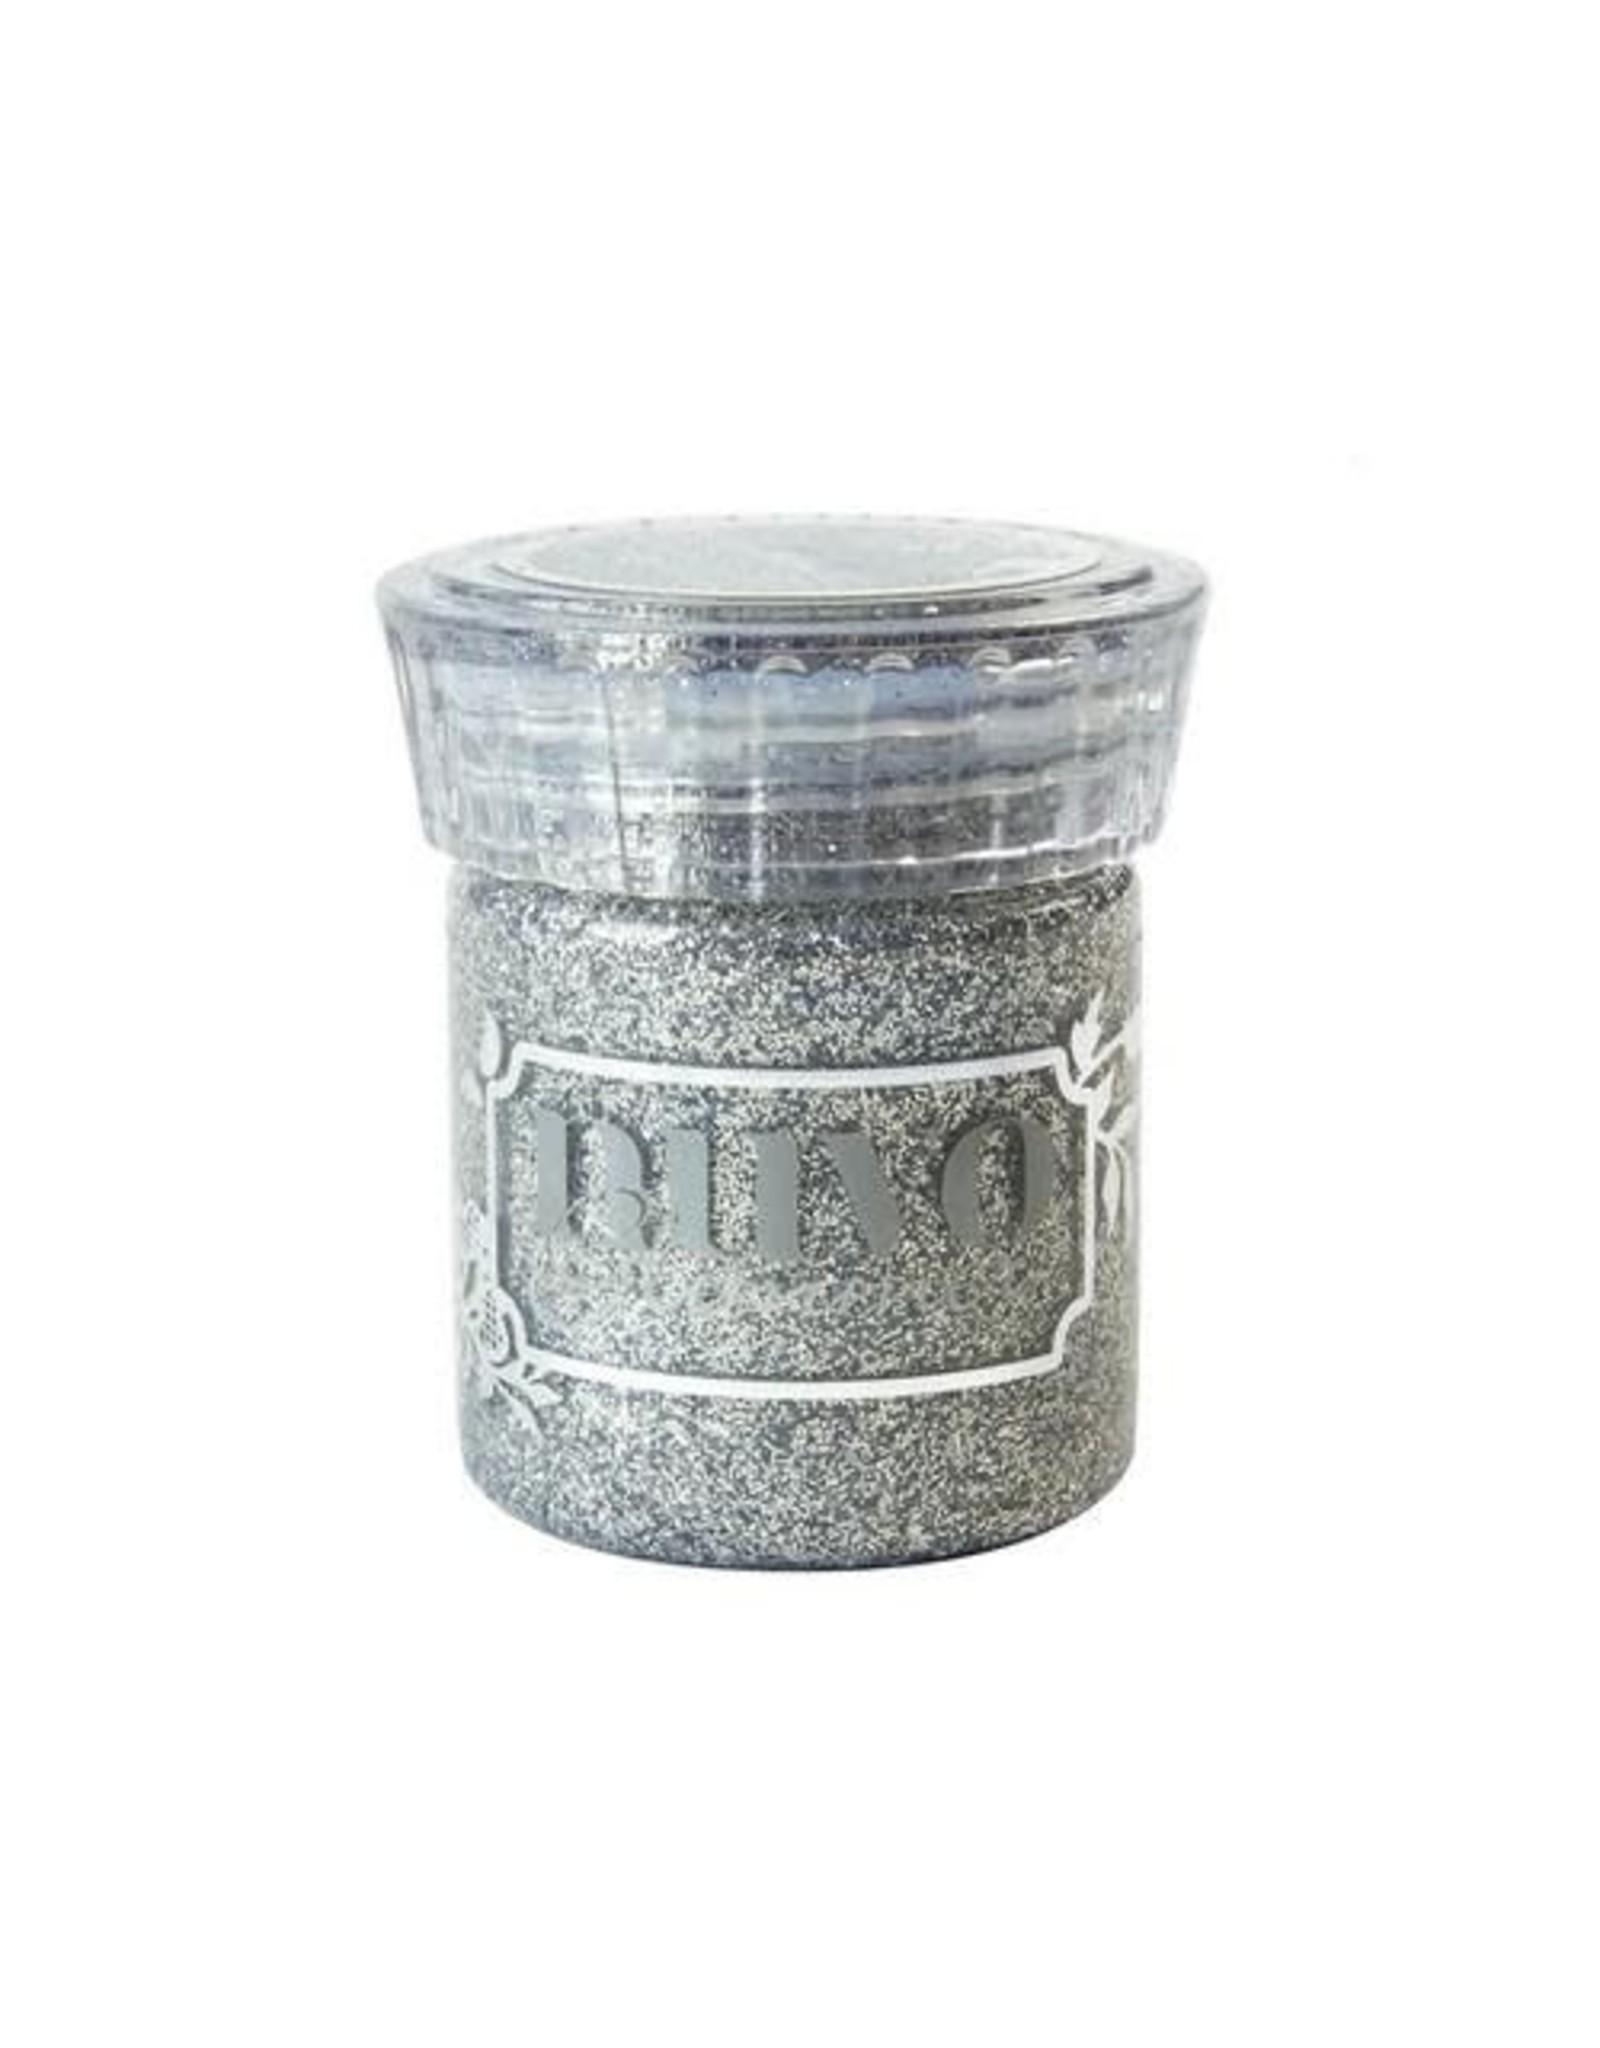 Nuvo glimmer Nuvo glimmer paste - silver gem 951N